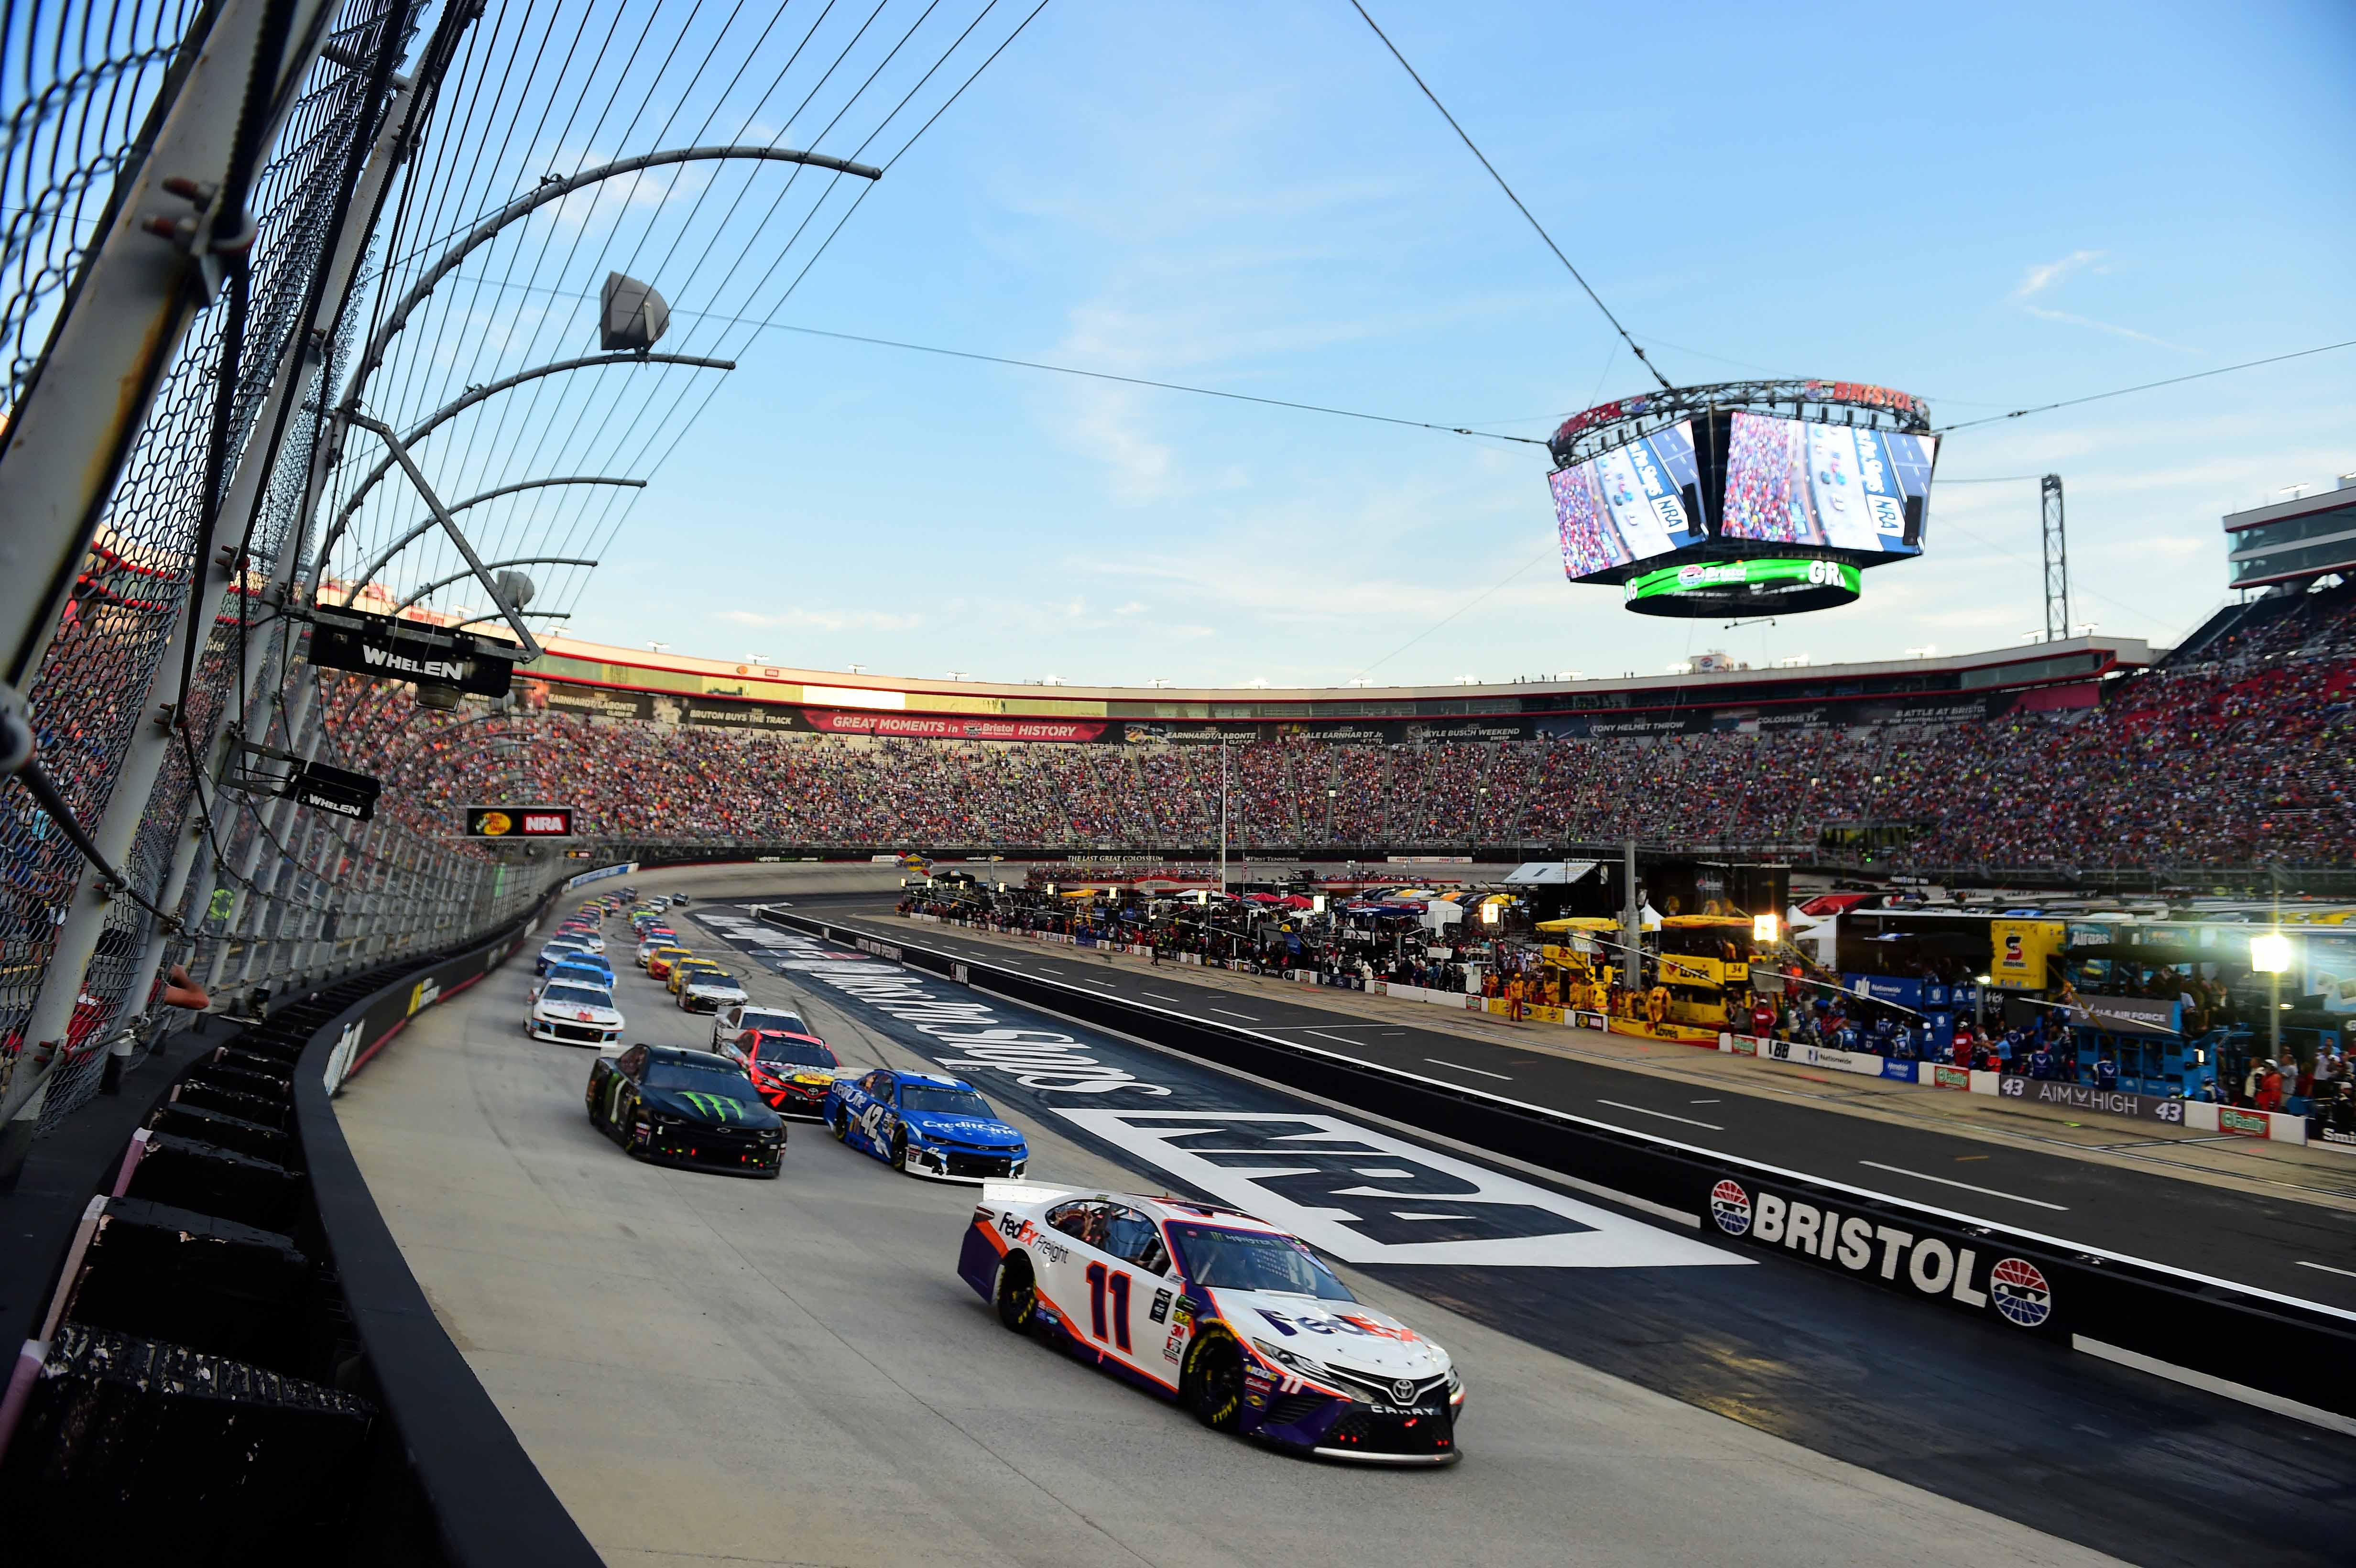 Denny Hamlin, Kurt Busch and Lyle Larson at Bristol Motor Speedway - NASCAR Cup Series